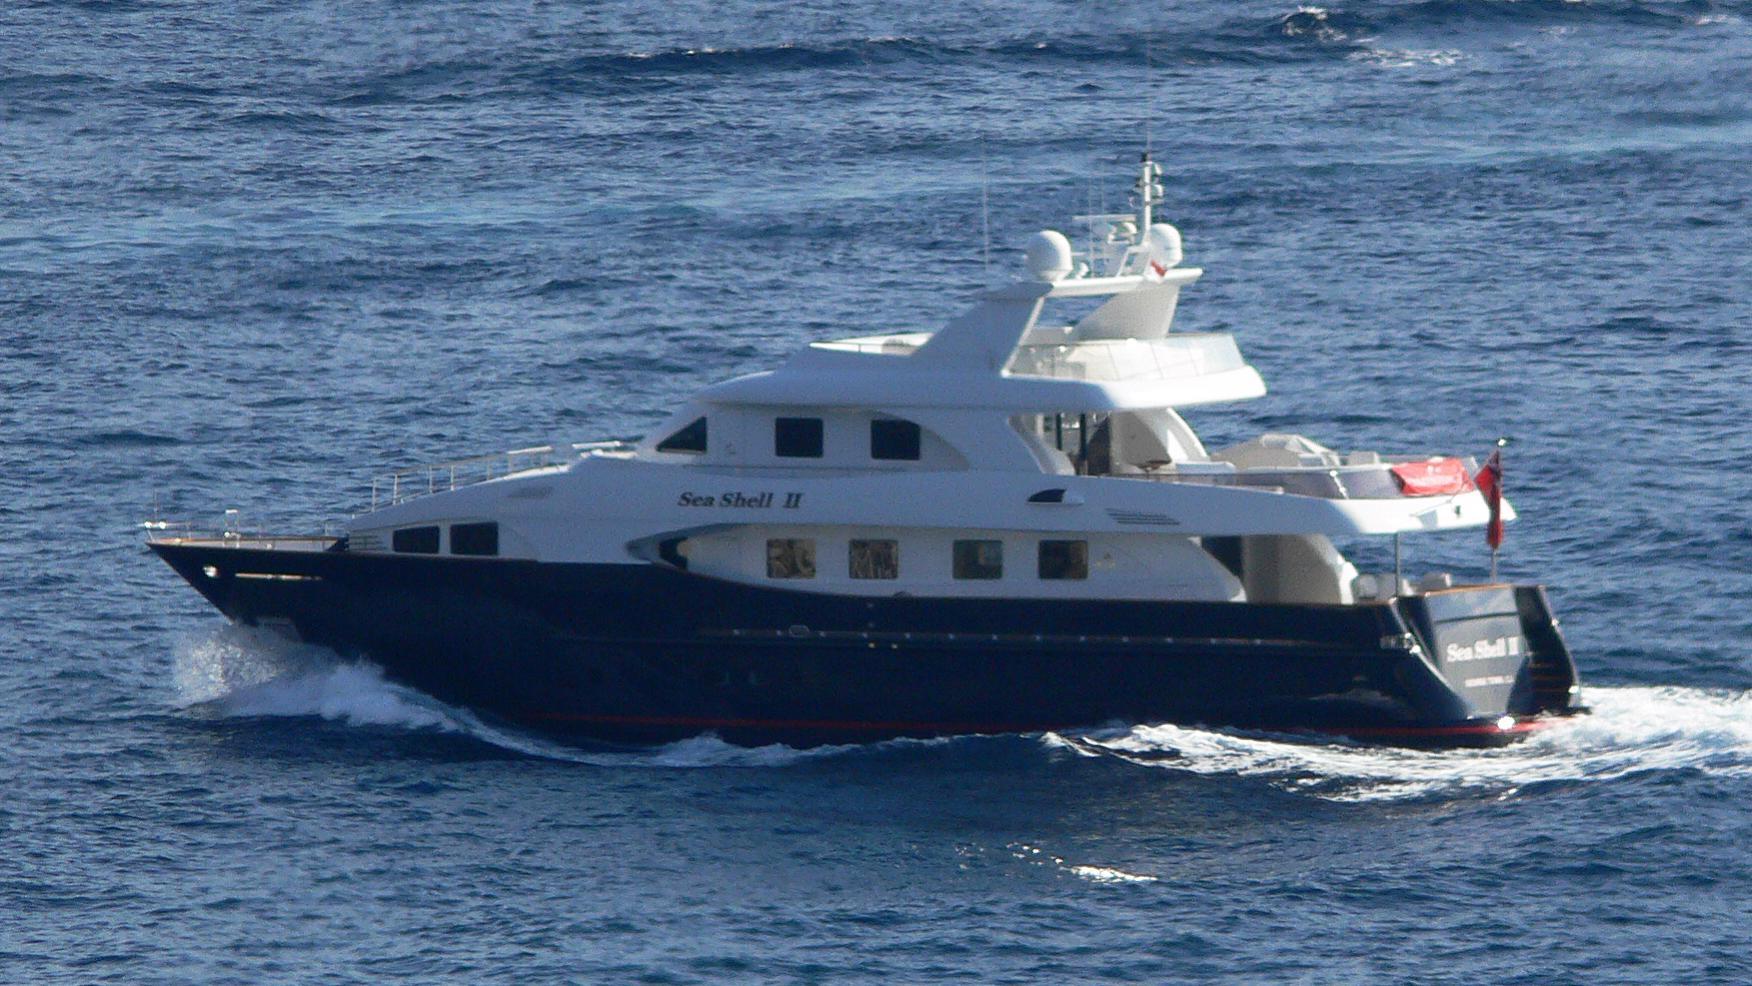 sea-shell-ii-yacht-exterior